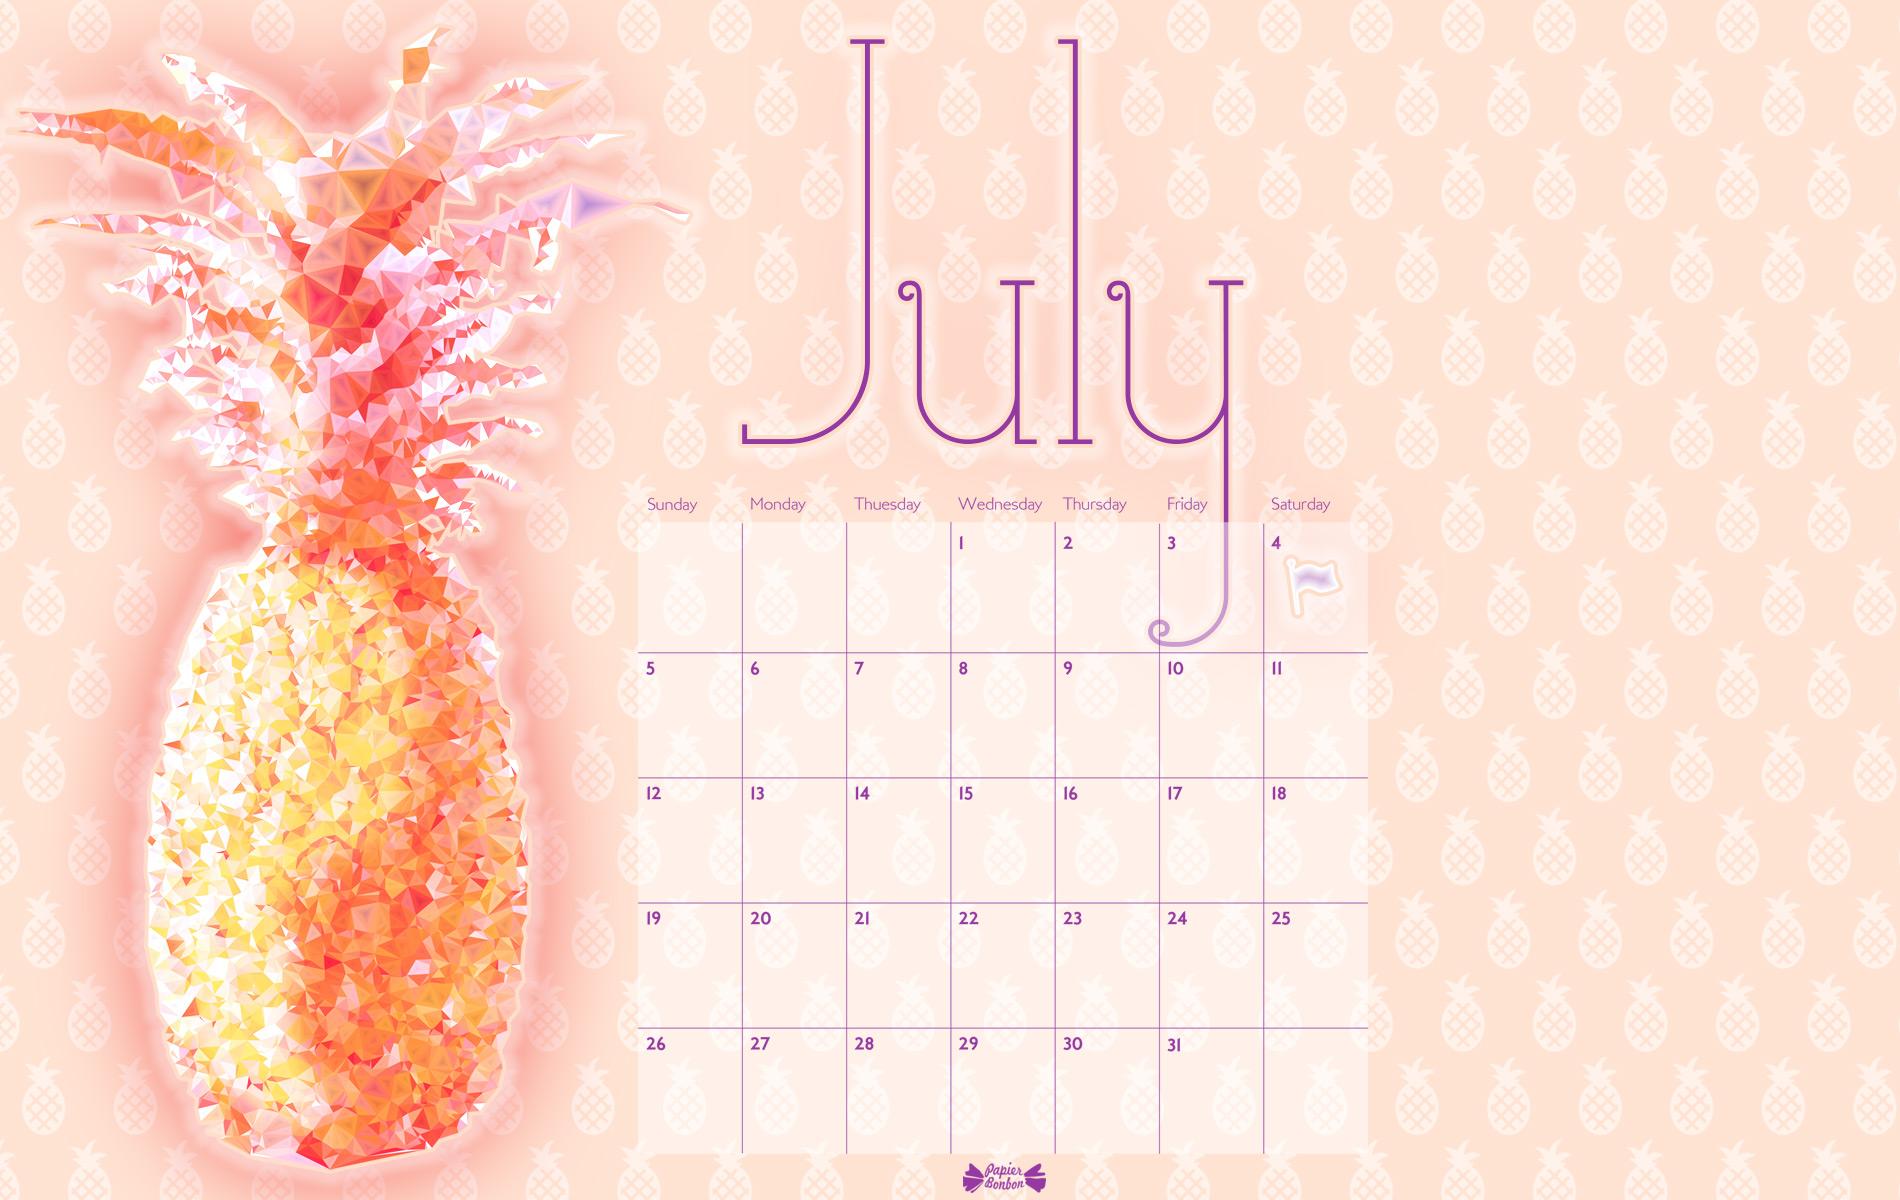 July printable calendar - Pineapple ! - Papier Bonbon